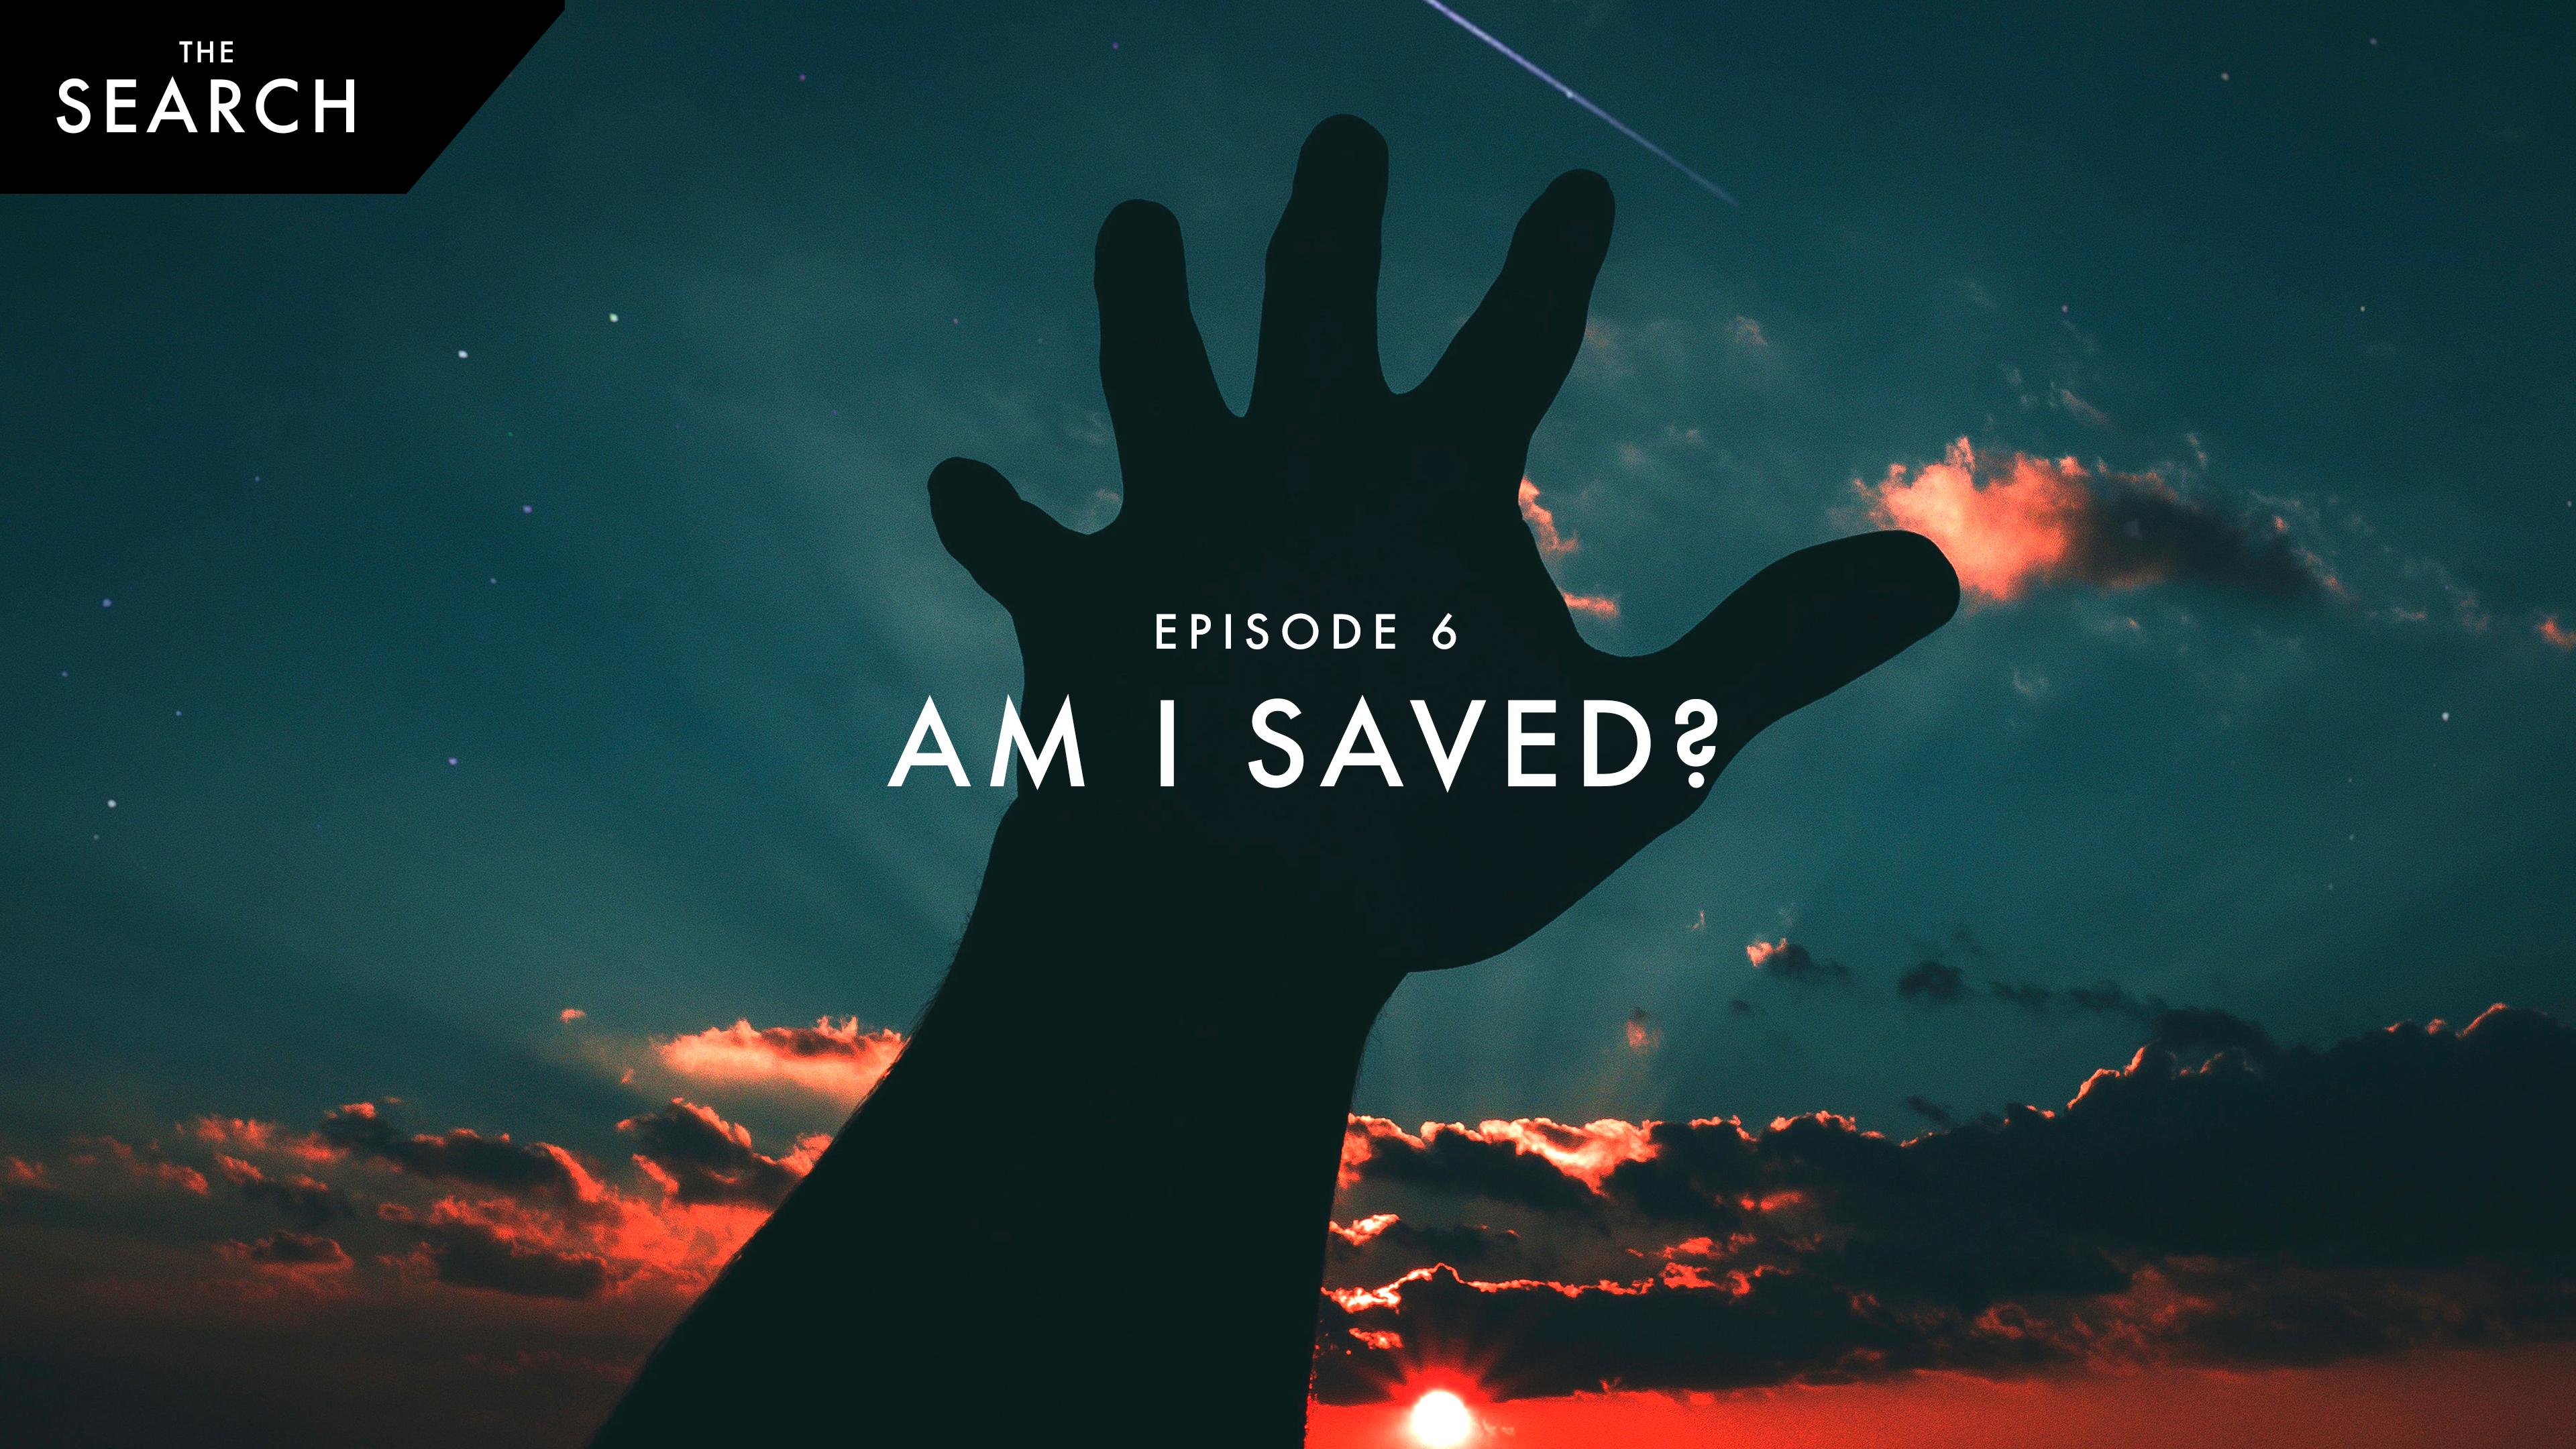 Episode 6: Am I Saved?